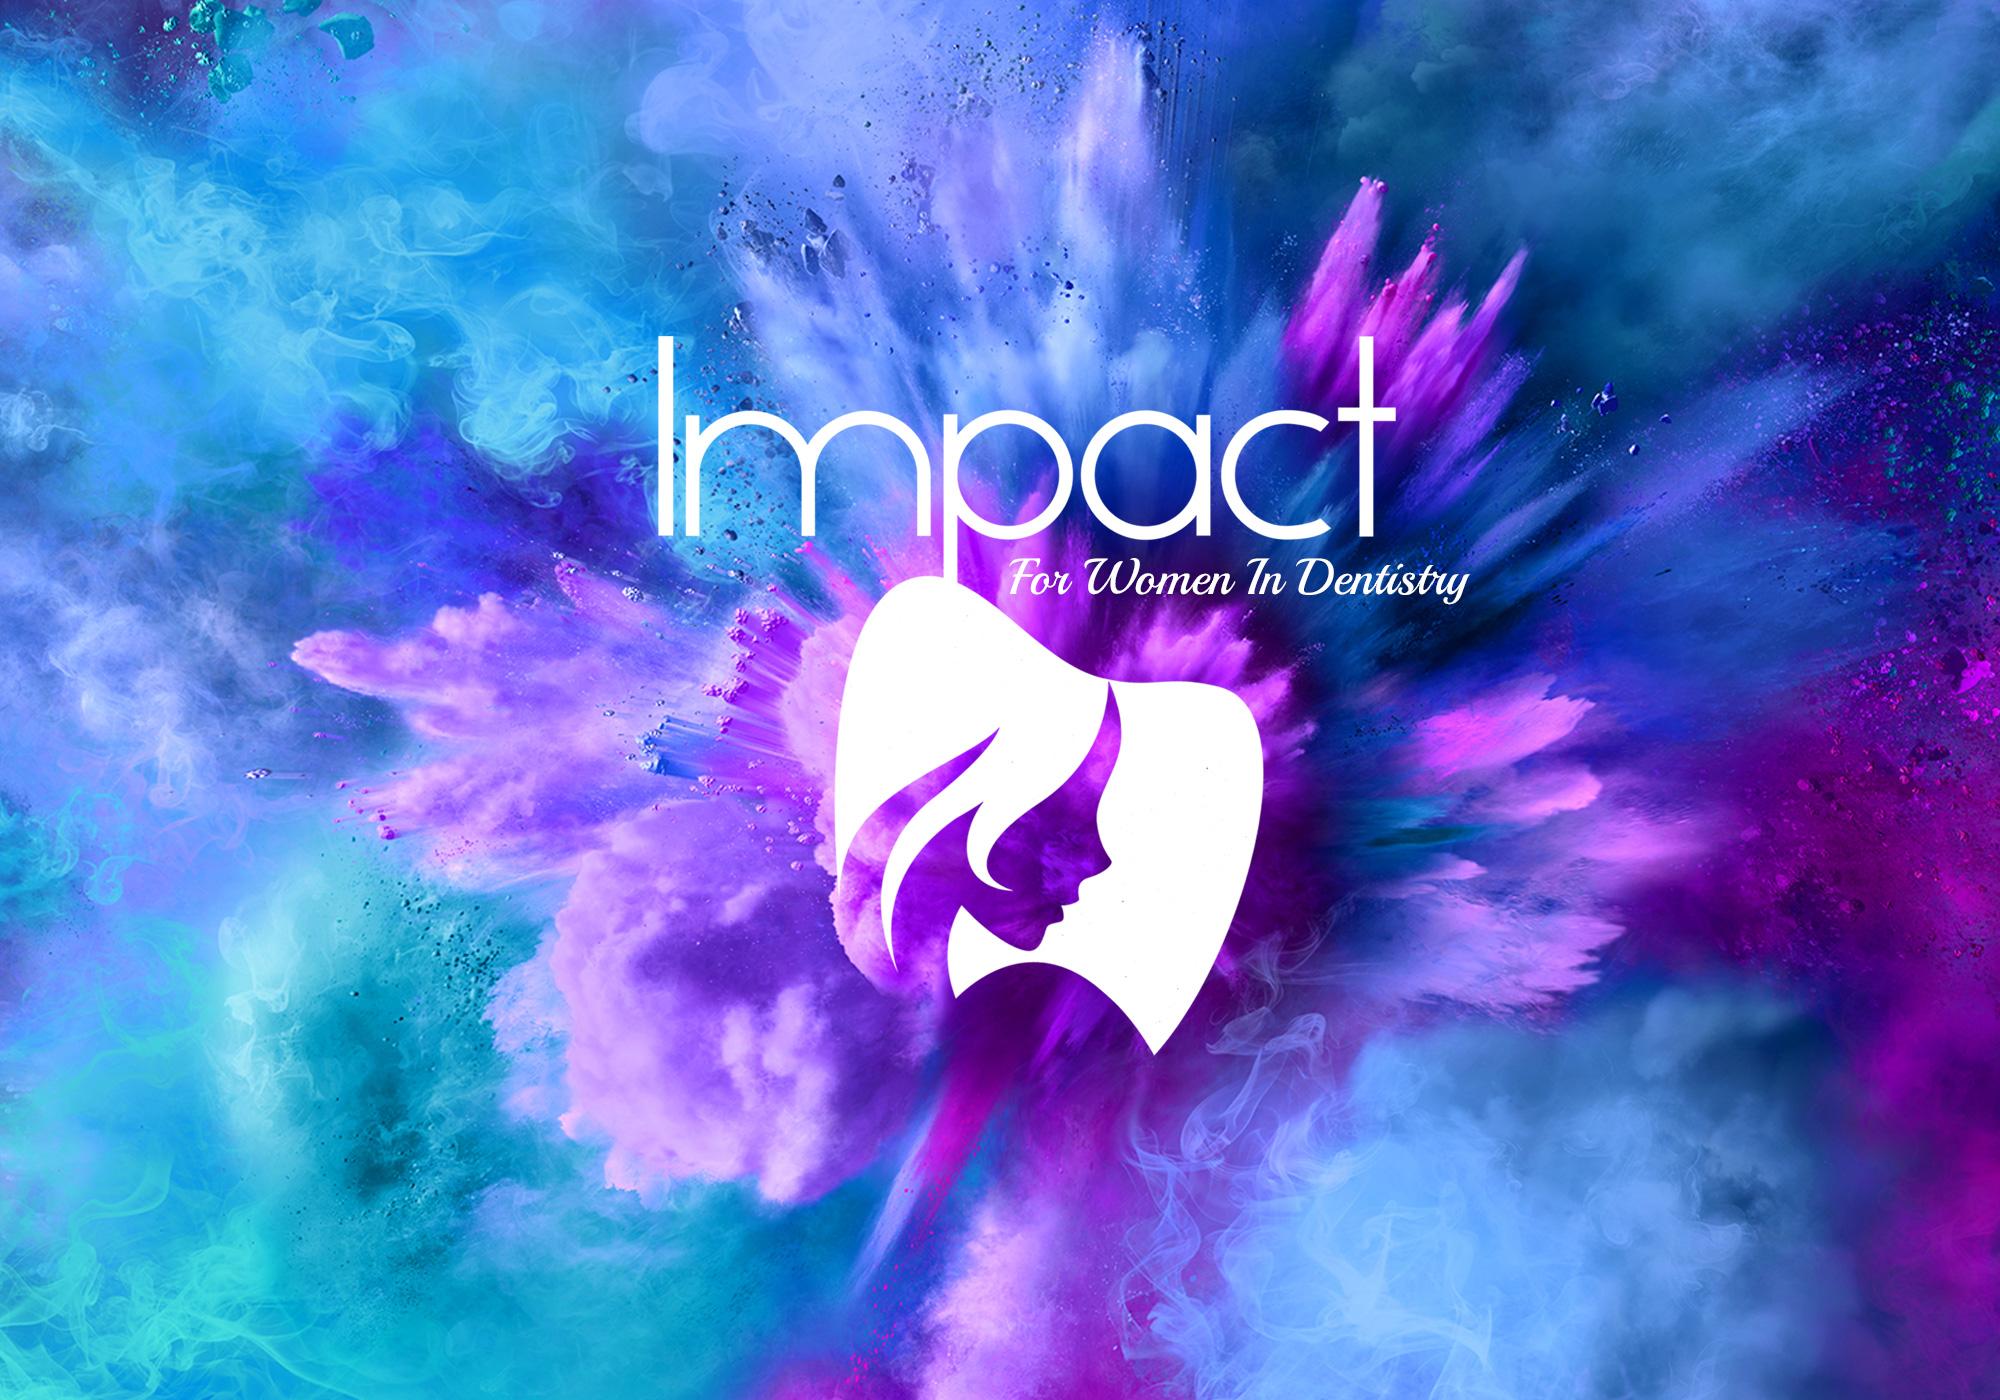 impact-header1.jpg